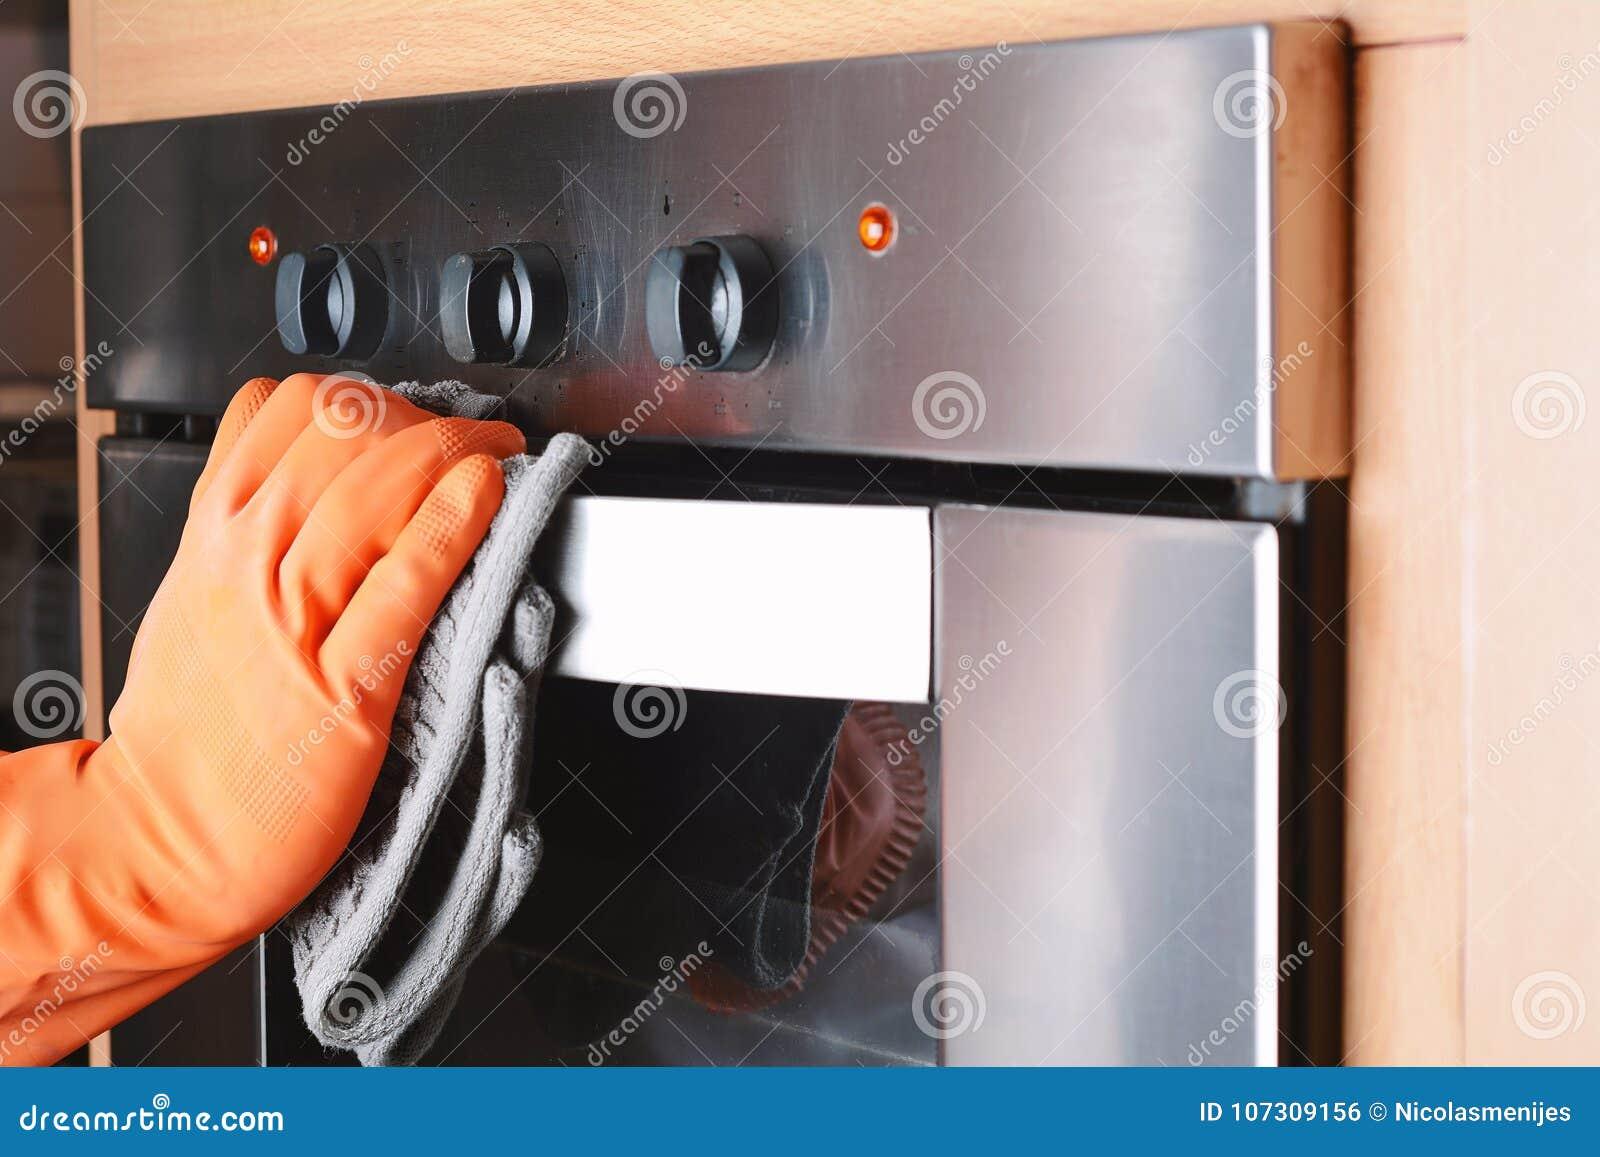 Housekeeping cleaning piekarnika kuchnia w domu